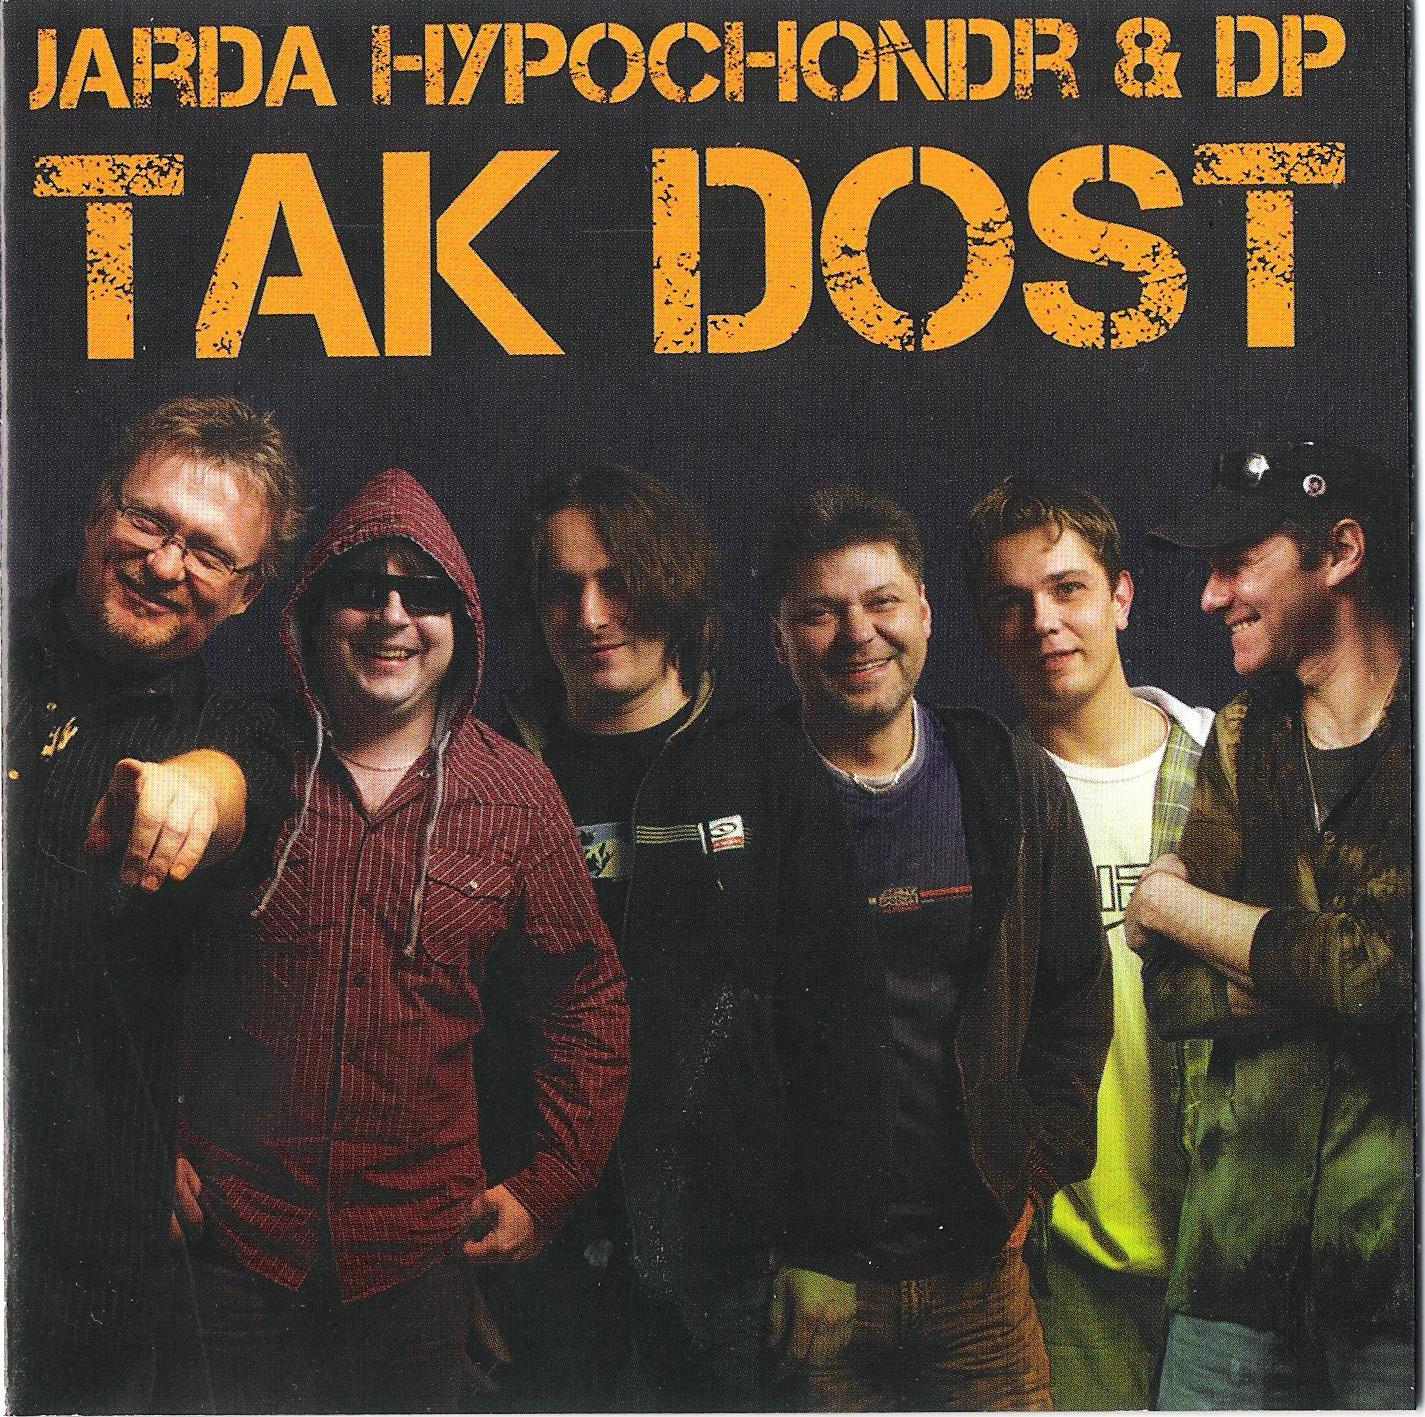 CD - Tak dost - Jarda Hypochondr & DP (s podpisem Jardy Hypochondra)